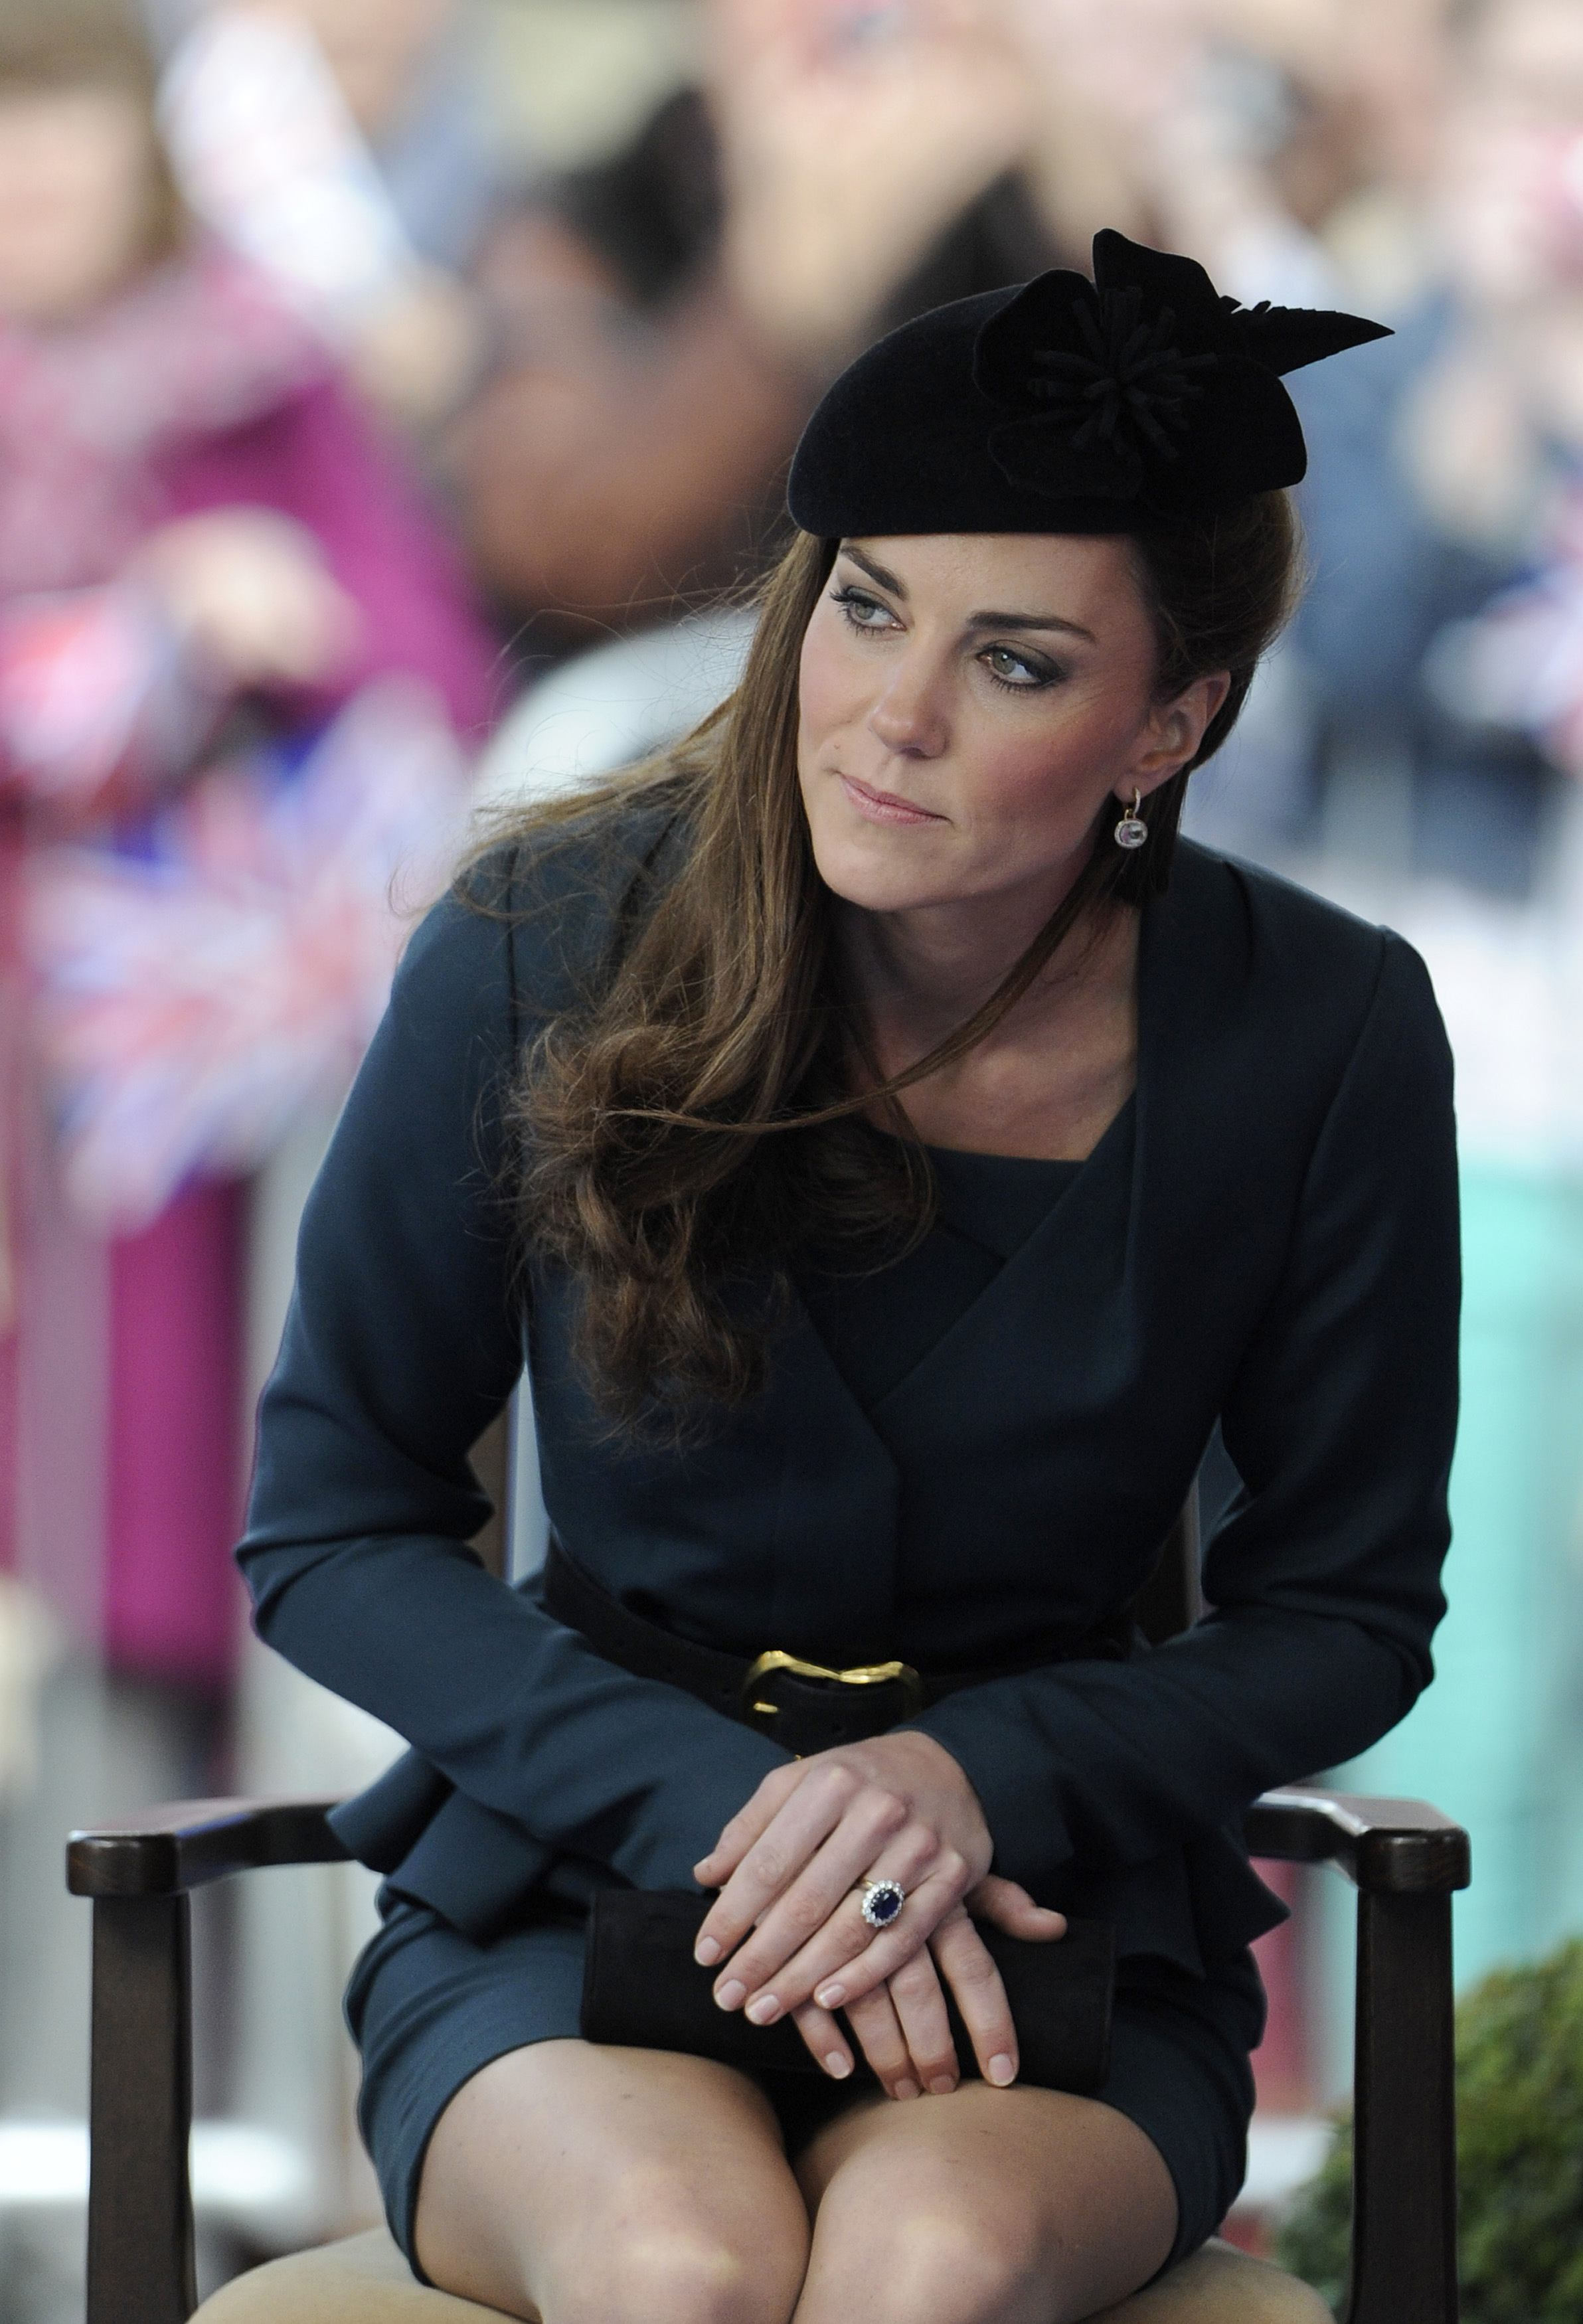 Kate Middleton compie 30 anni: le foto